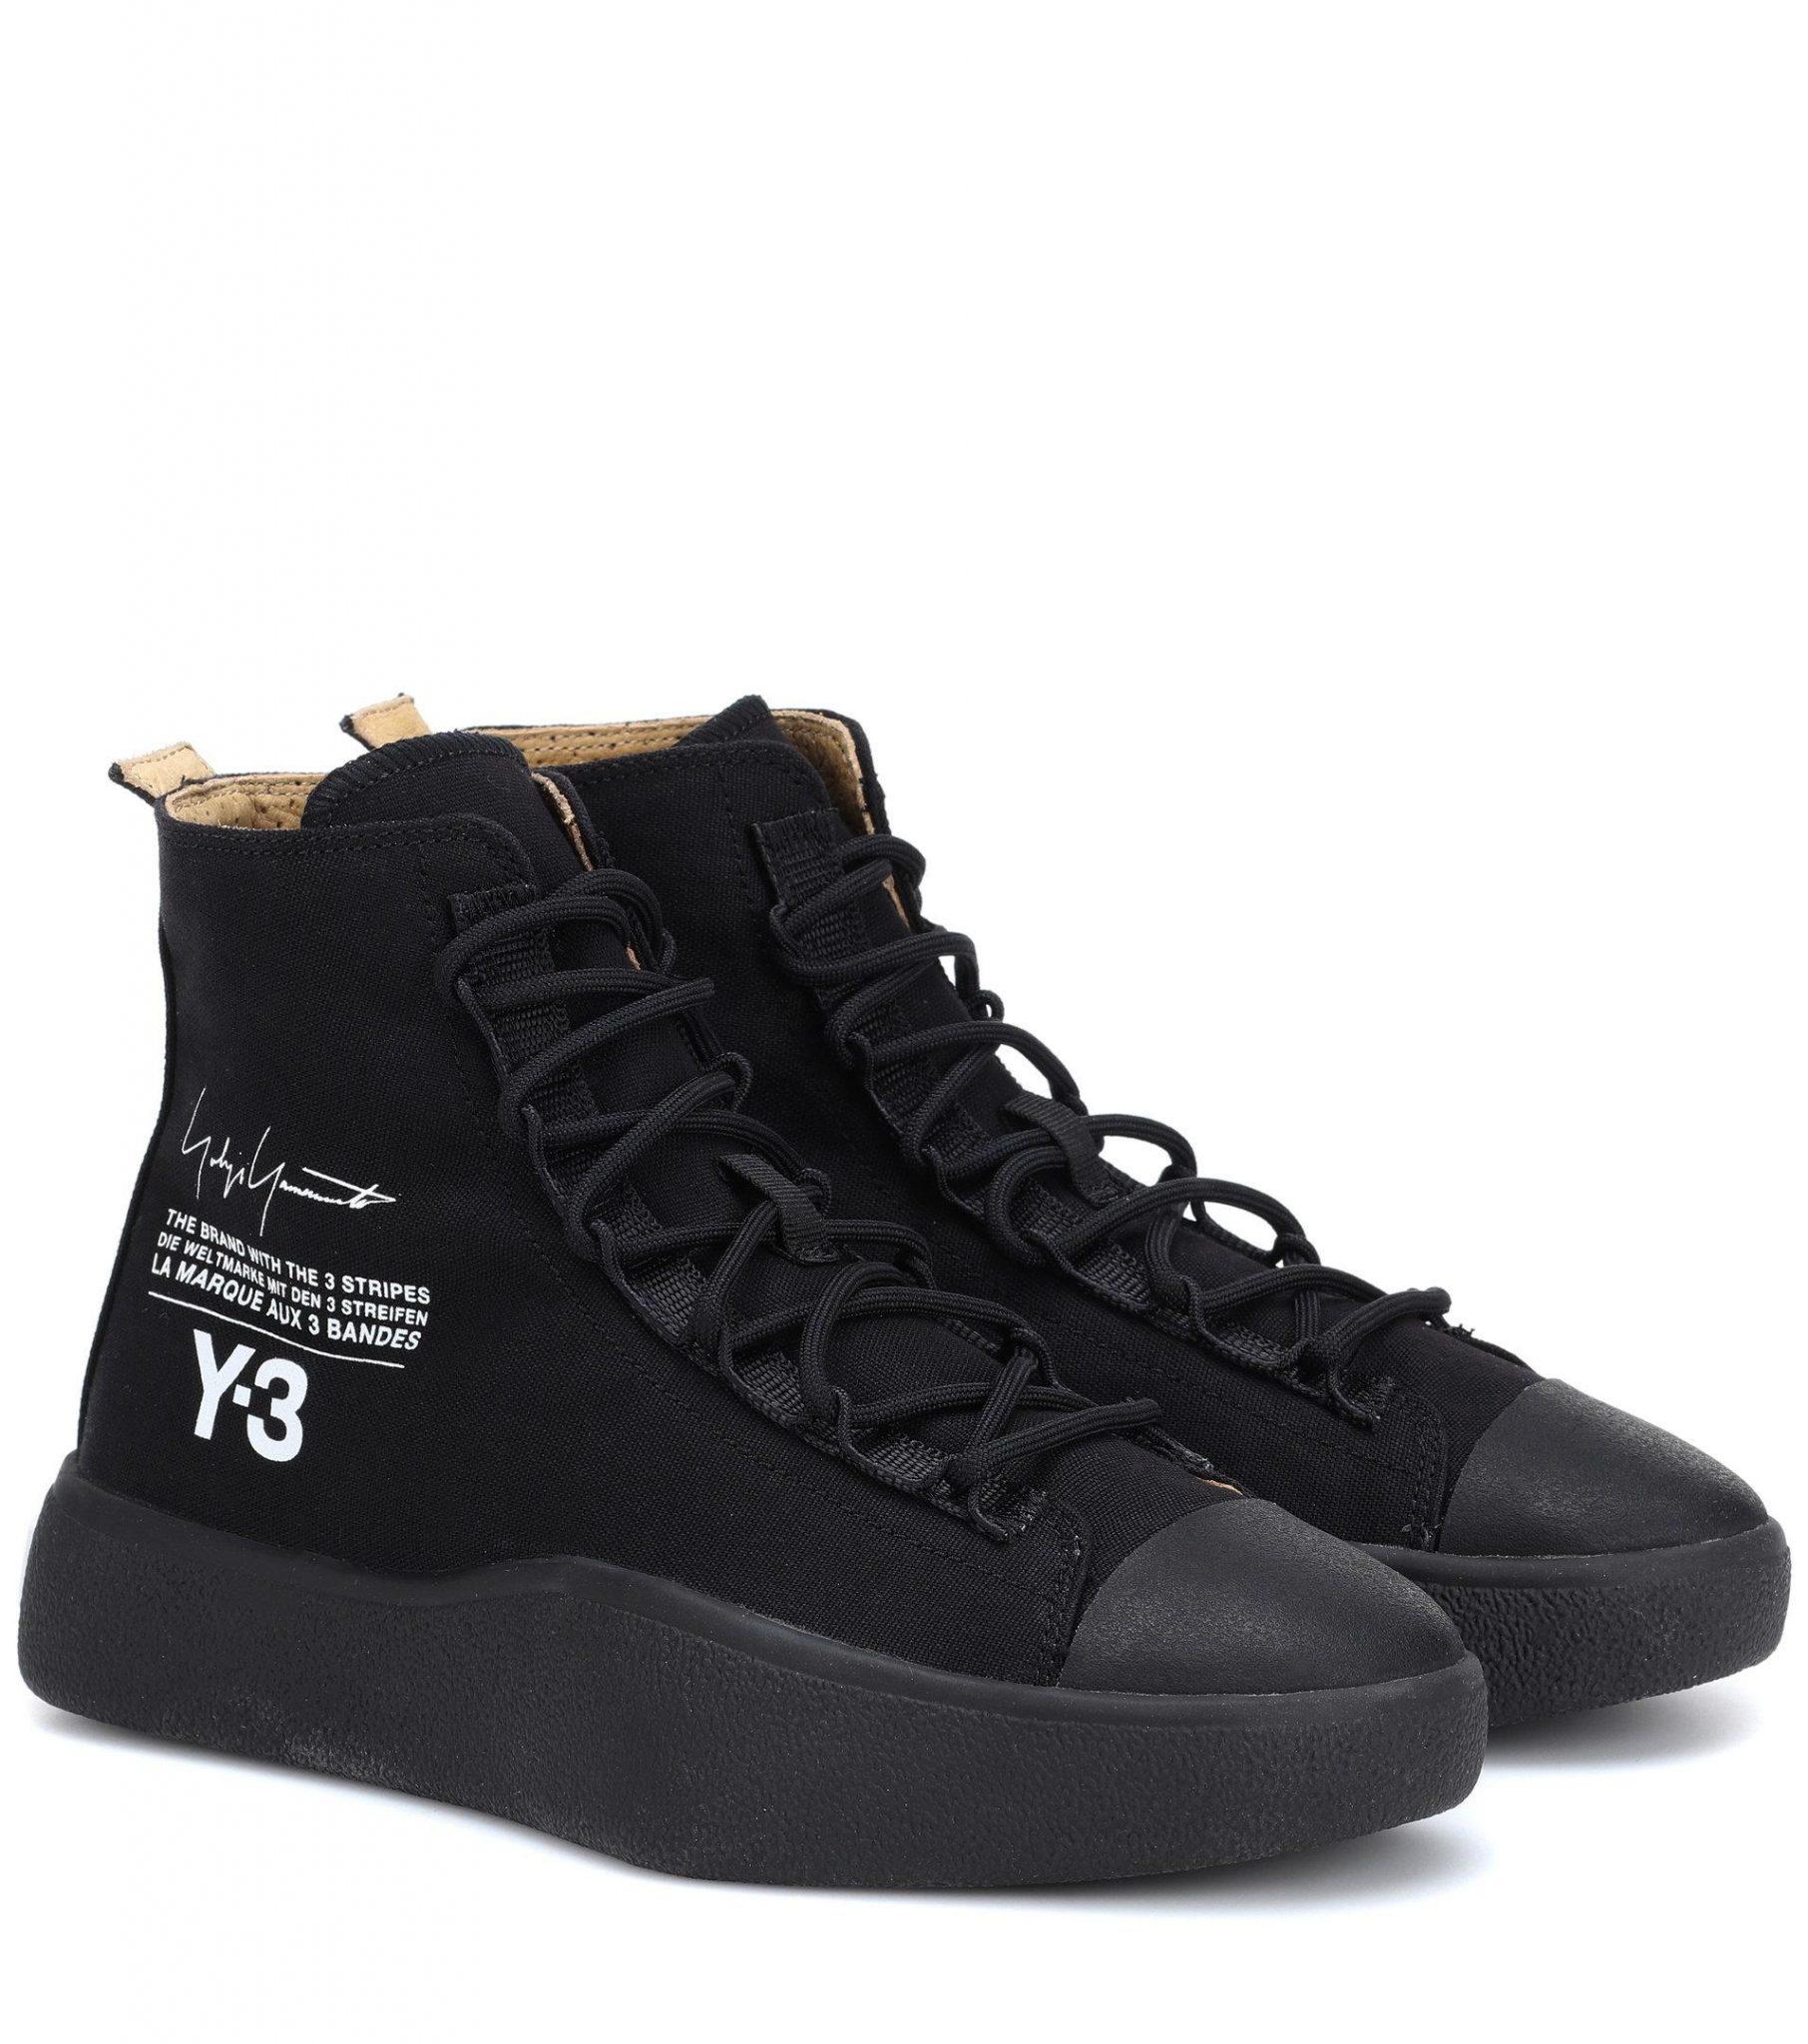 ba4b44f1e Y-3 BASHYO HIGH-TOP BLACK SNEAKERS — Adidas